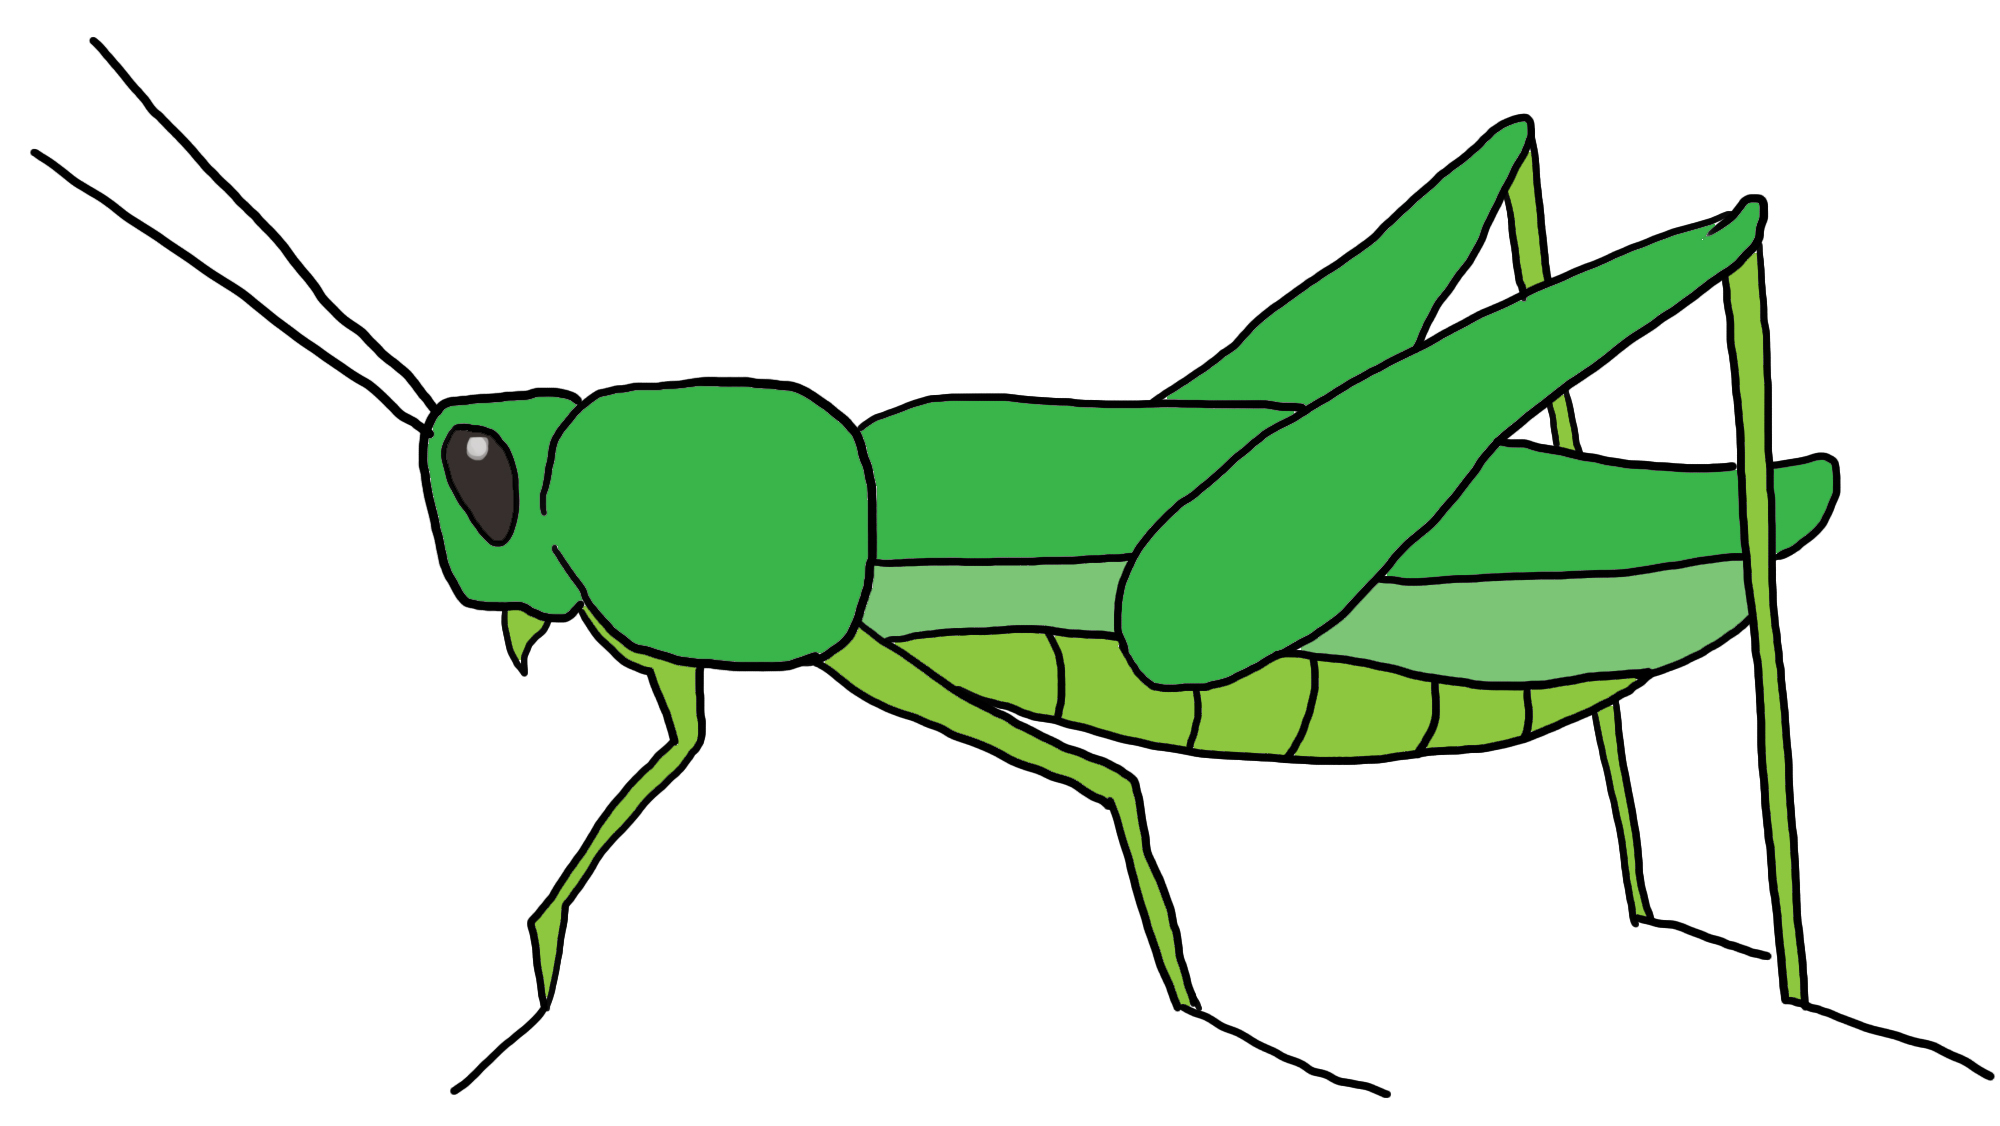 Grasshopper clipart Grasshopper%20clipart Grasshopper Free Clipart Panda